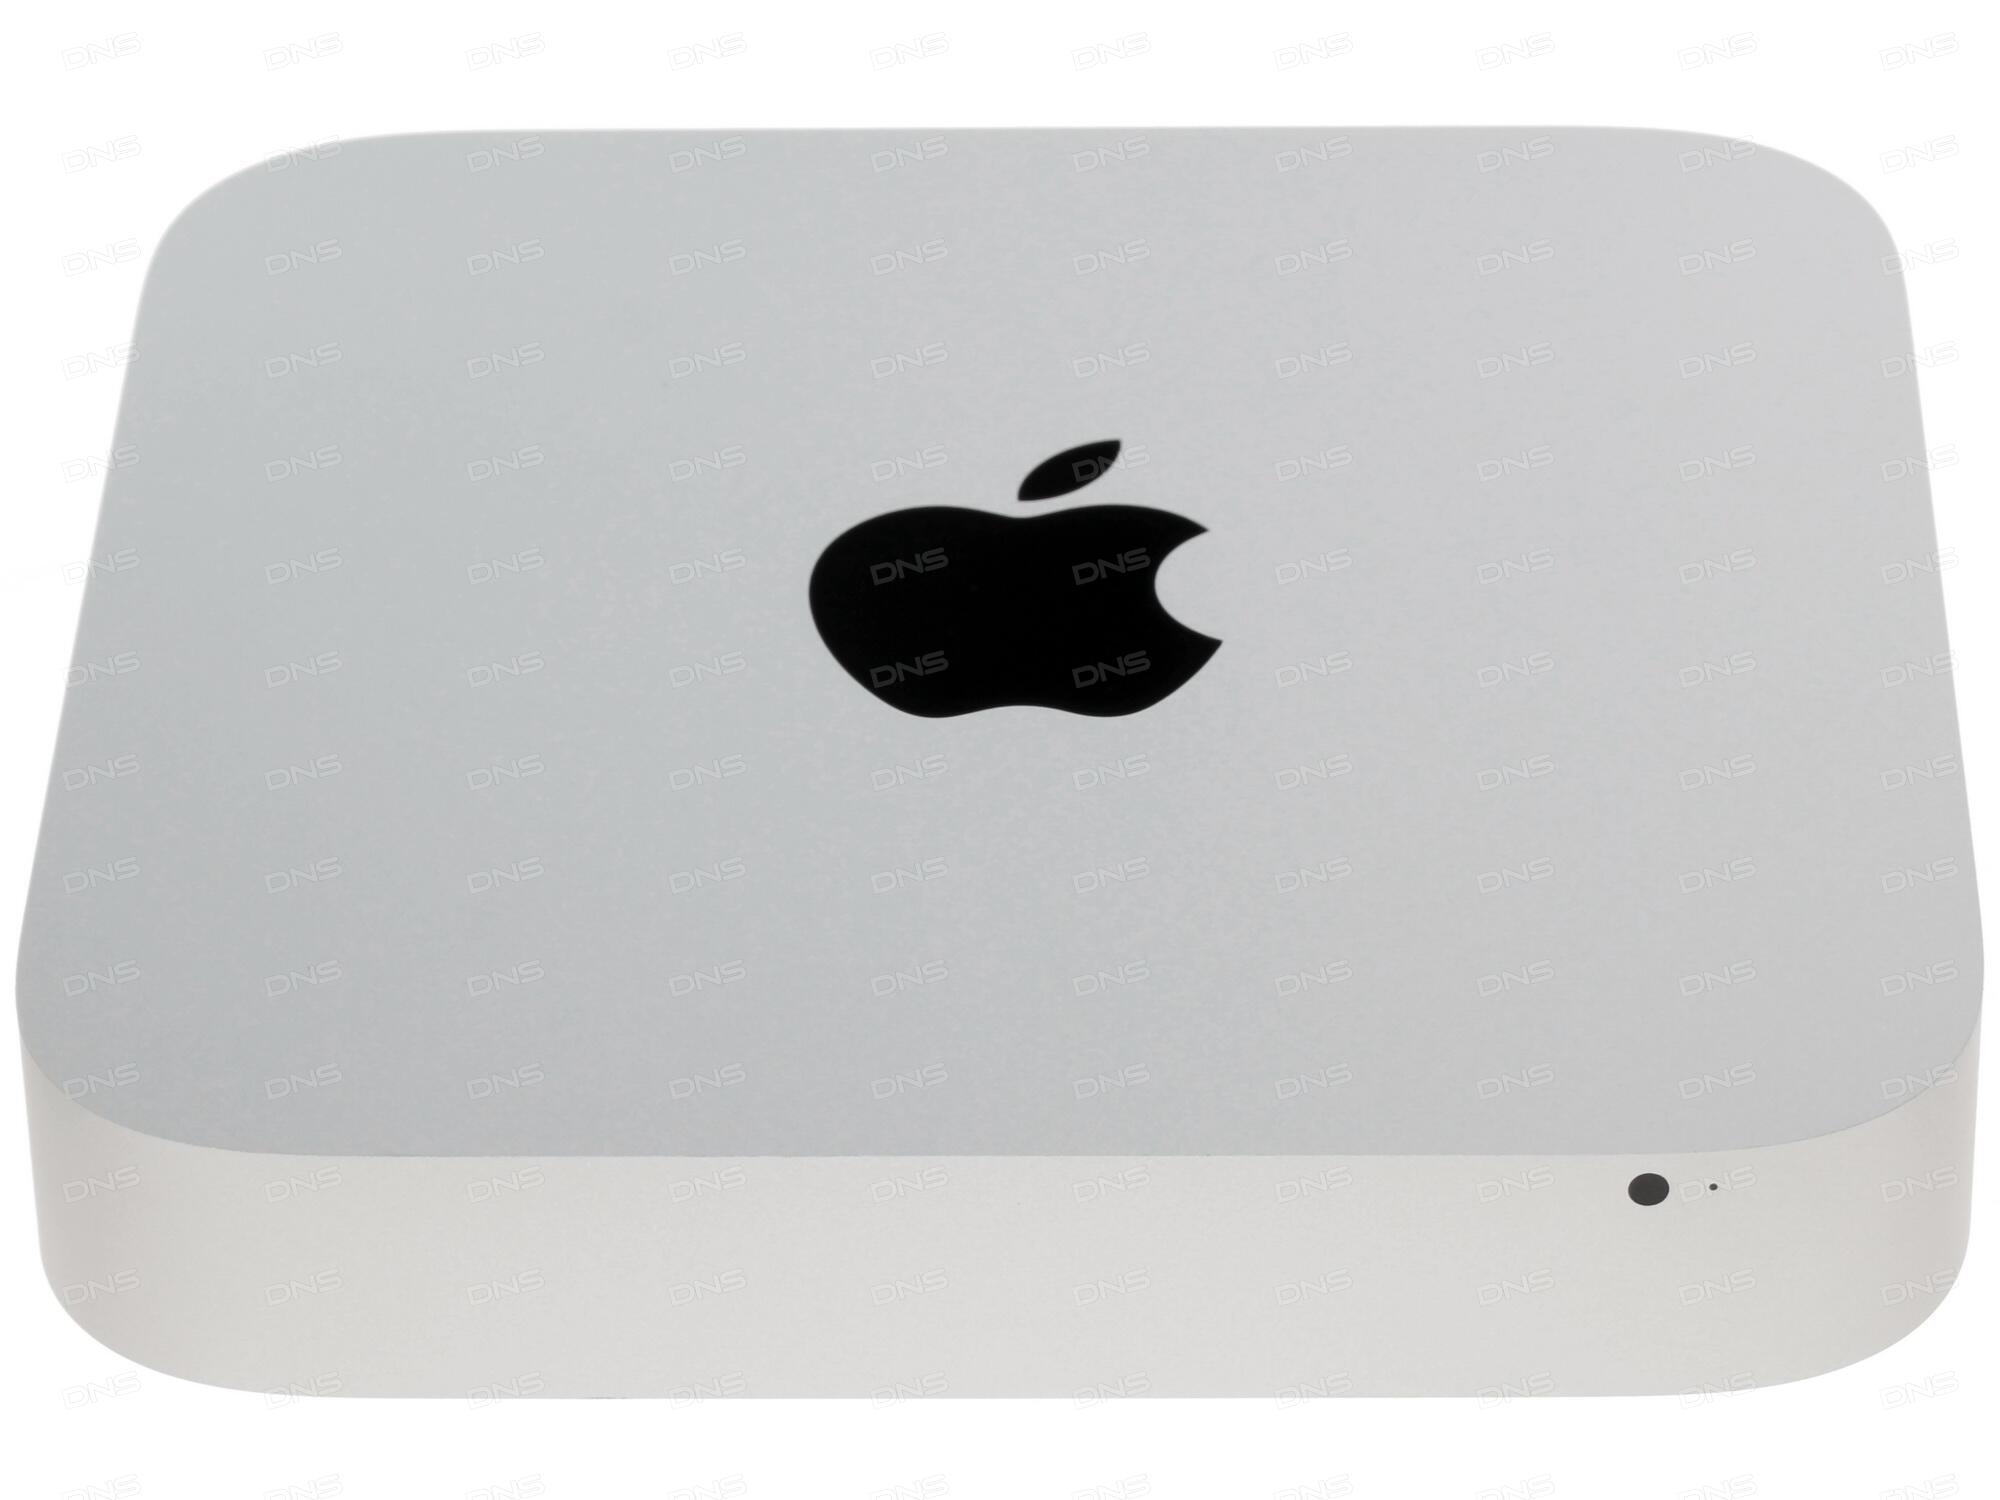 Неттоп APPLE Mac Mini Silver MGEQ2RU/A (Intel Core i5 2.8 GHz/8192Mb/1000Gb/NO ODD/Intel Iris Graphics/Wi-Fi/Bluetooth/HDMI/Mac OS X)